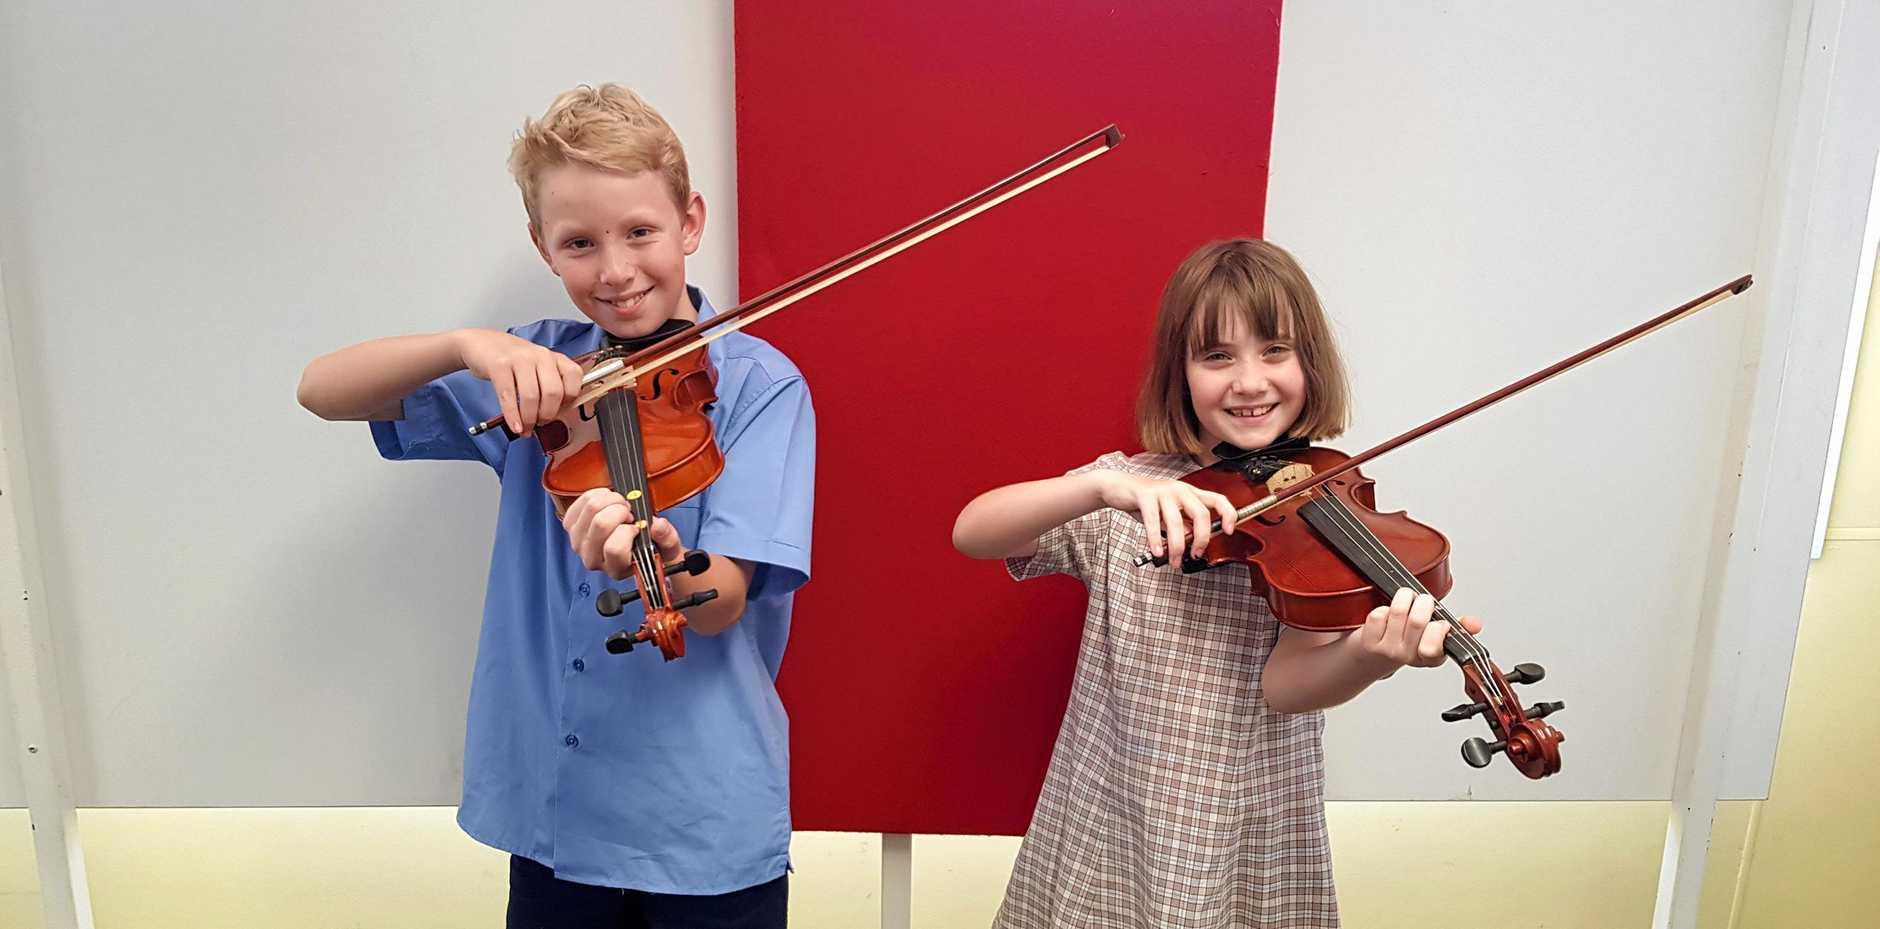 SWEET SYMPHONY: St Mary's Catholic School students Finn Clarke and Taya Sallur play some tunes.